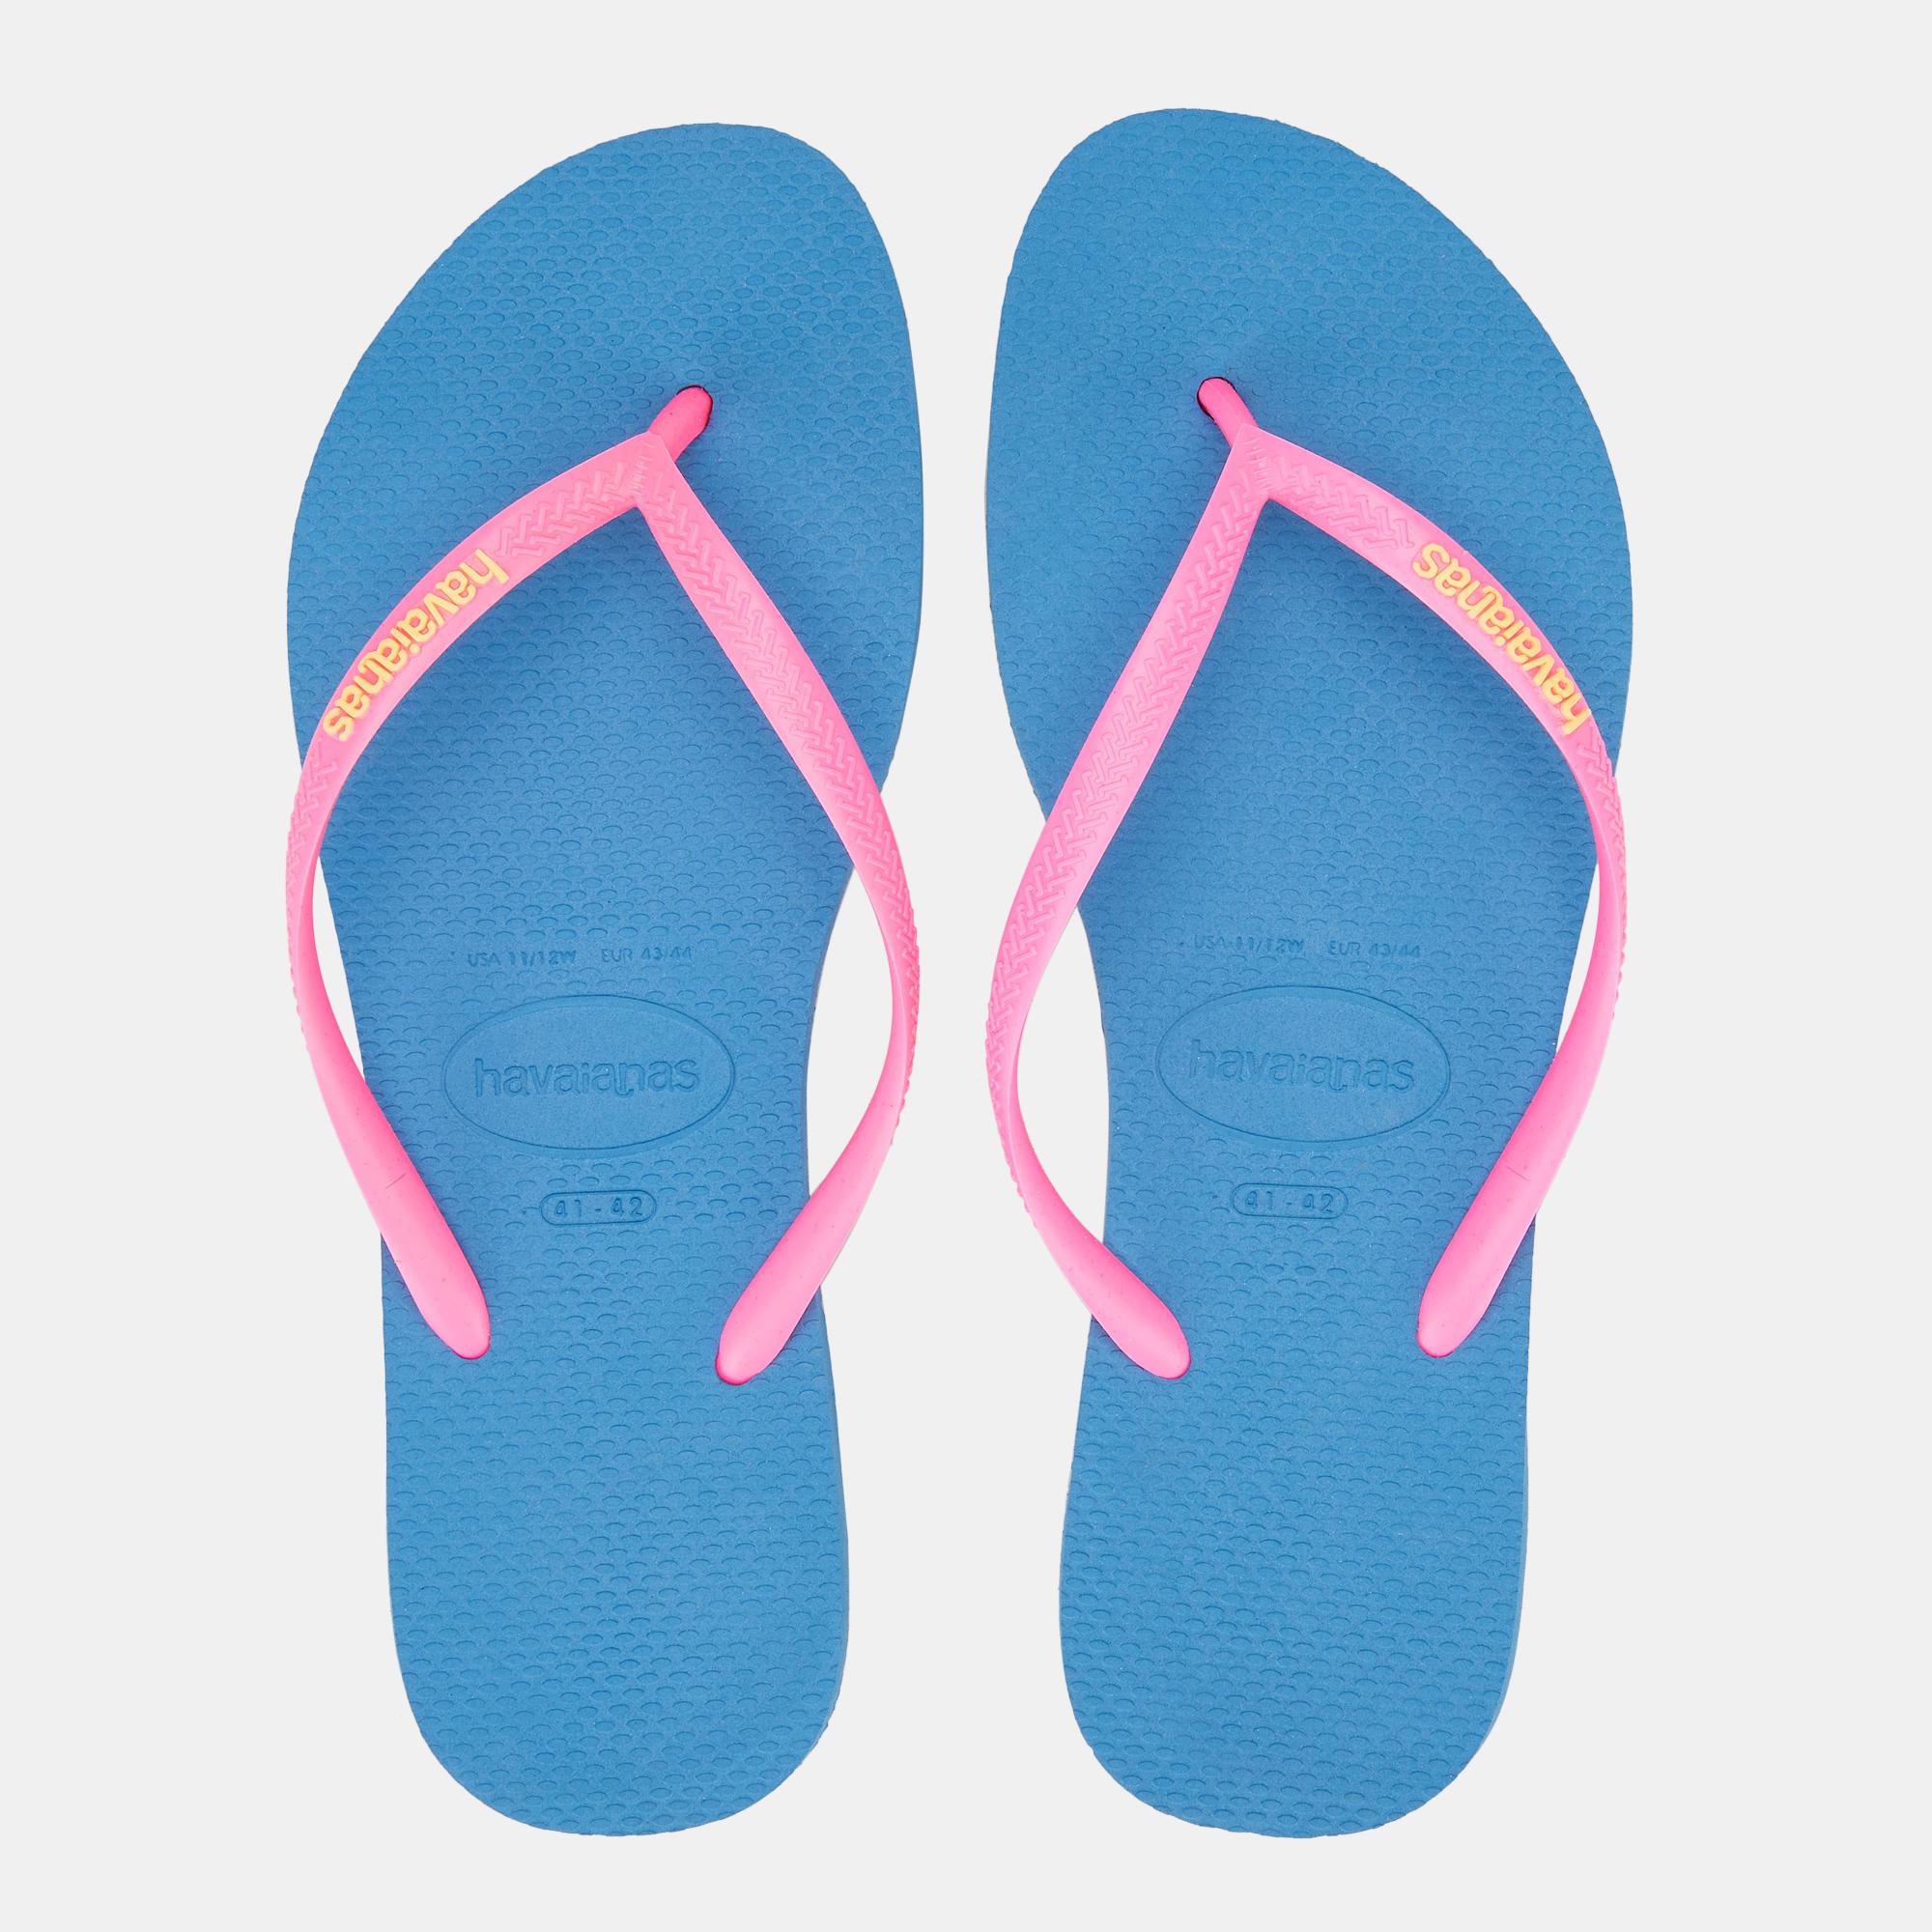 86abe950d63d Havaianas Women s Slim Logo Flip Flops